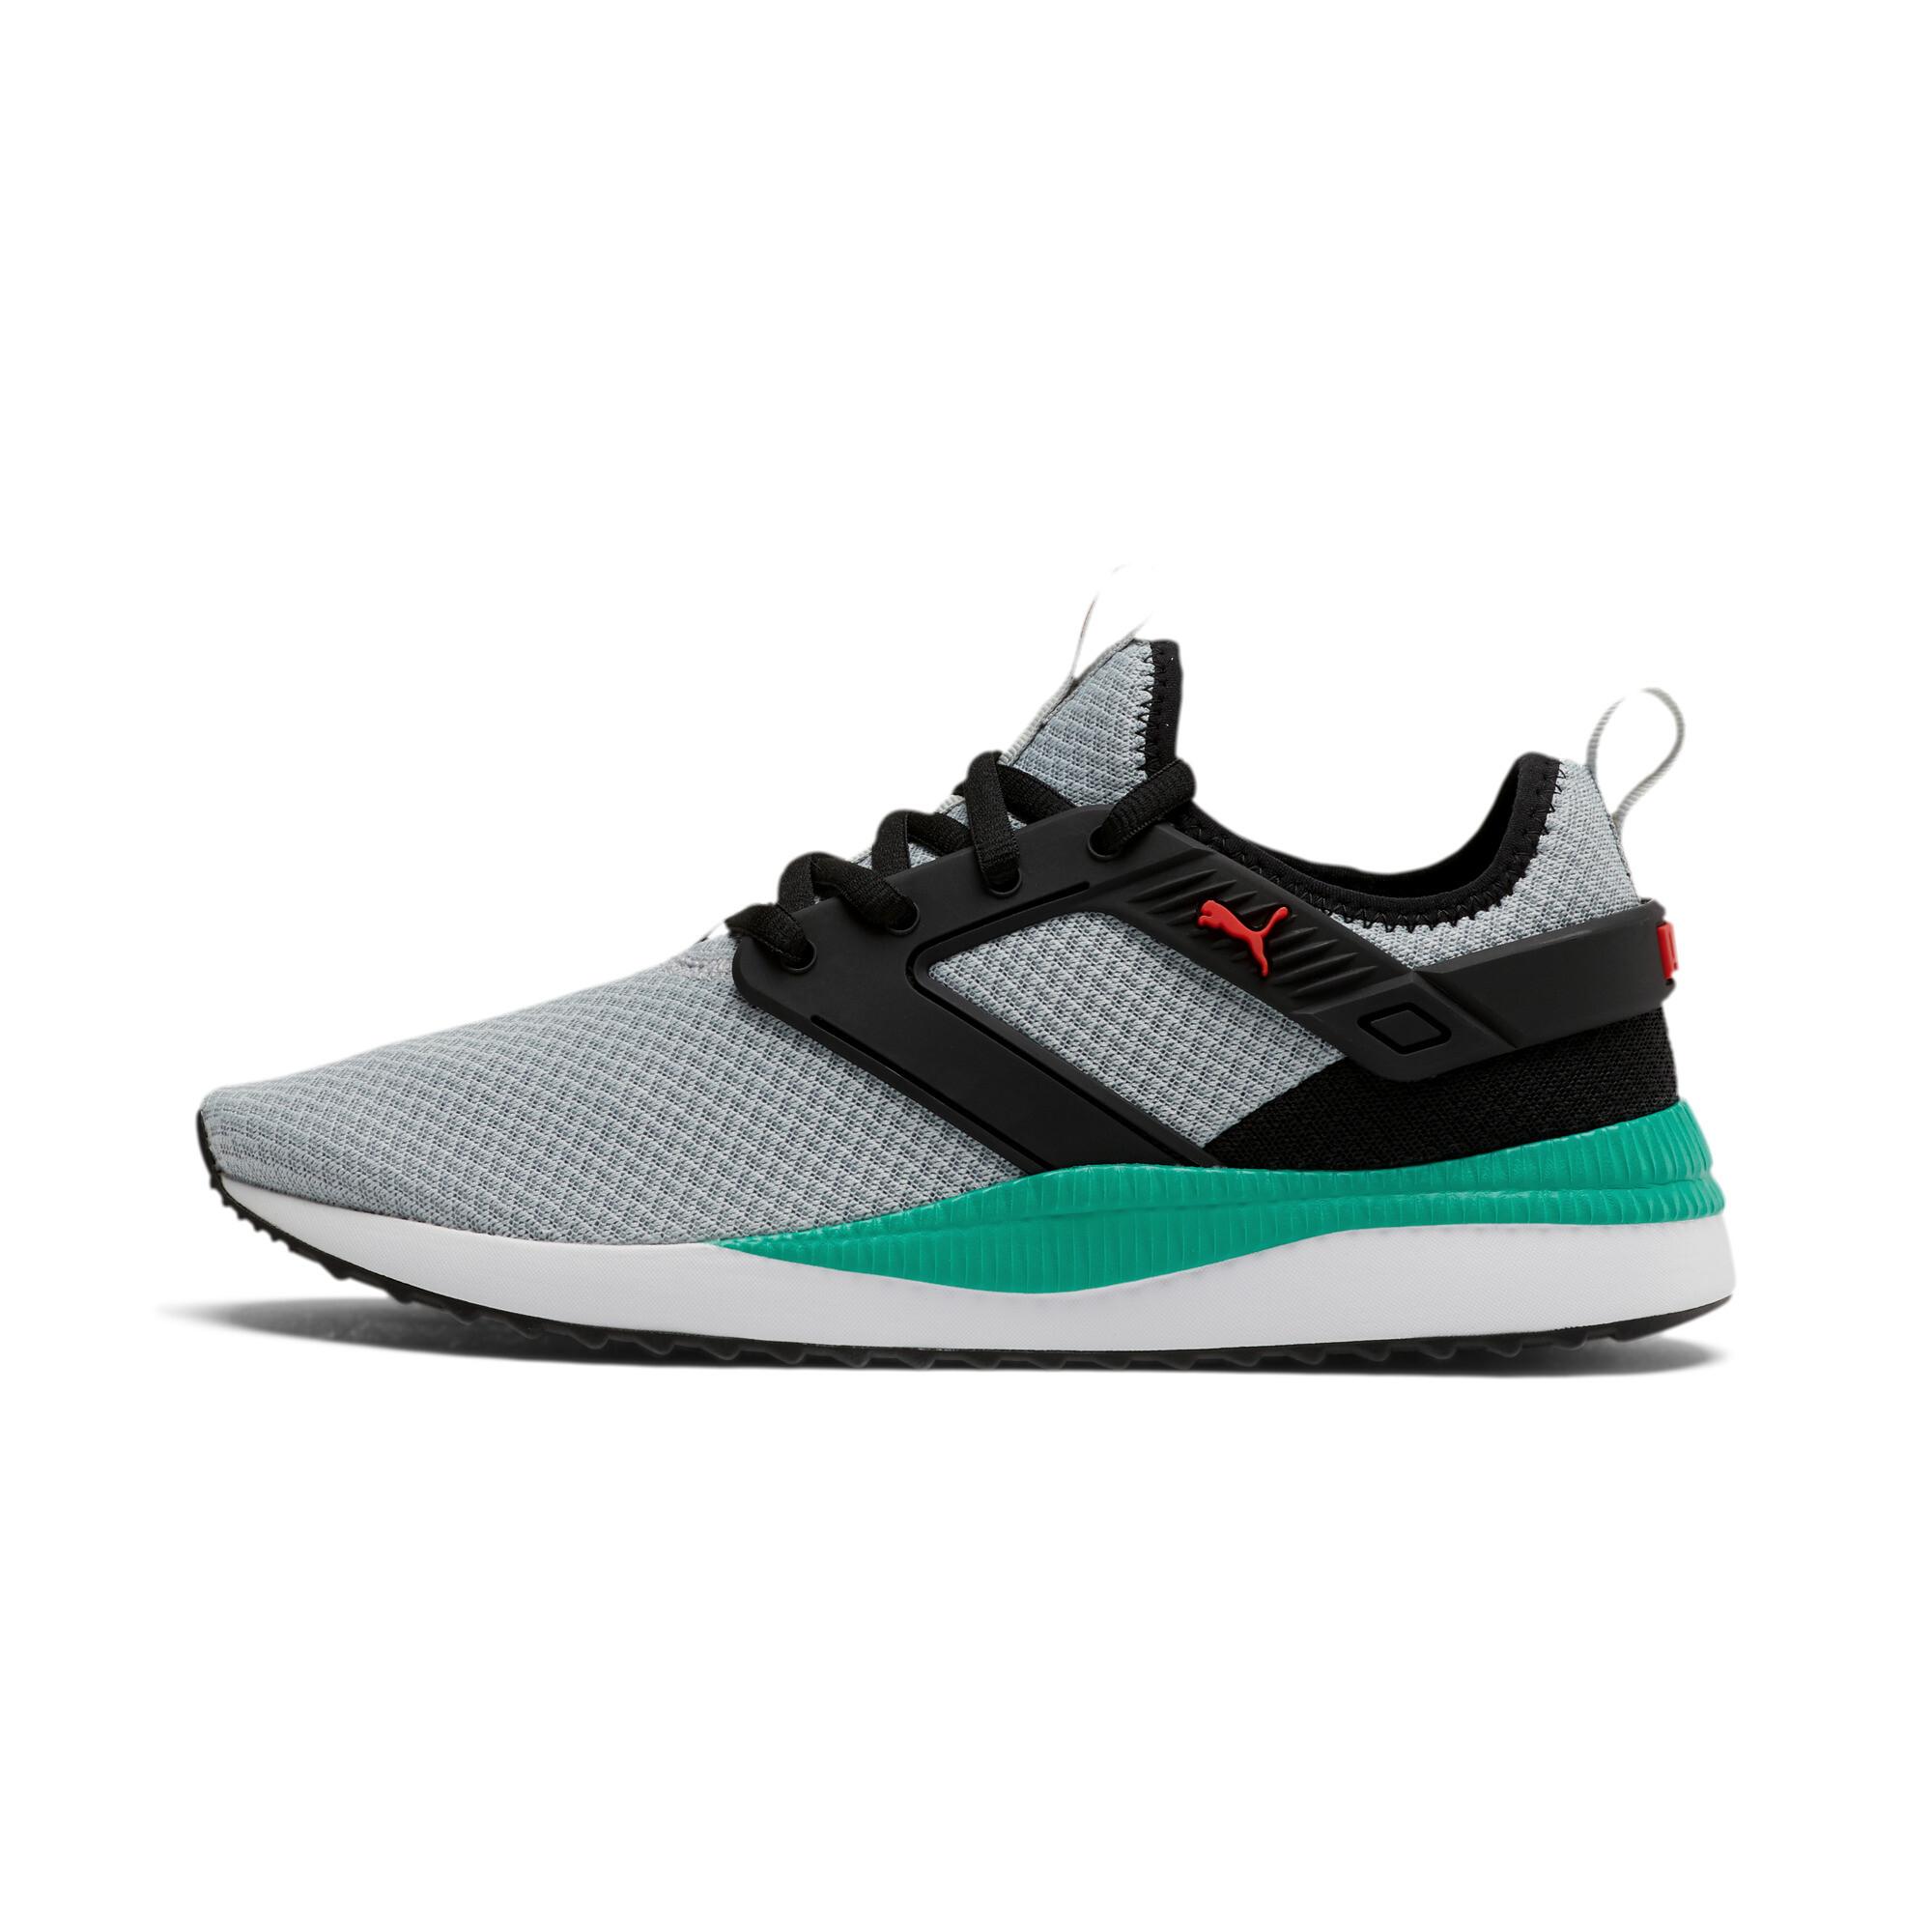 PUMA-Unisex-Pacer-Next-Excel-Mesh-Training-Shoes thumbnail 4